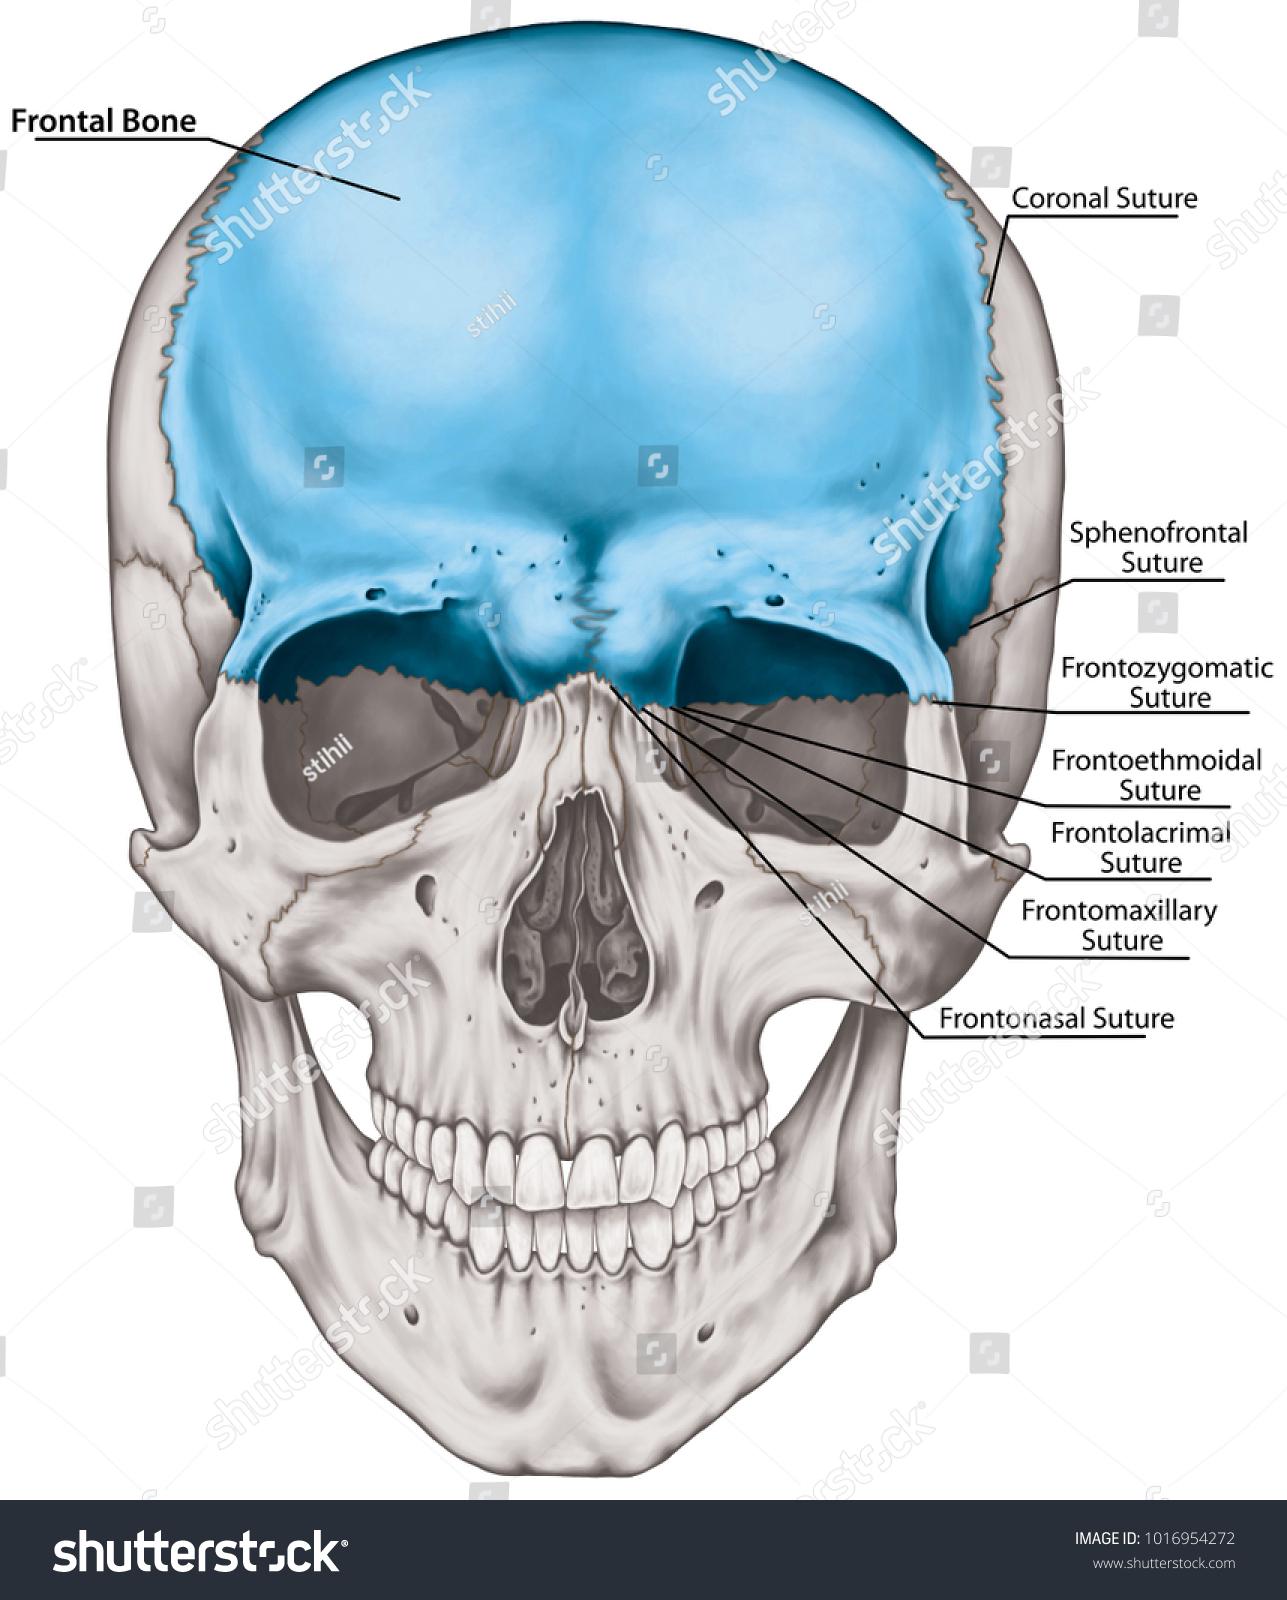 Frontal Bone Cranium Bones Head Skull Stock Illustration 1016954272 ...